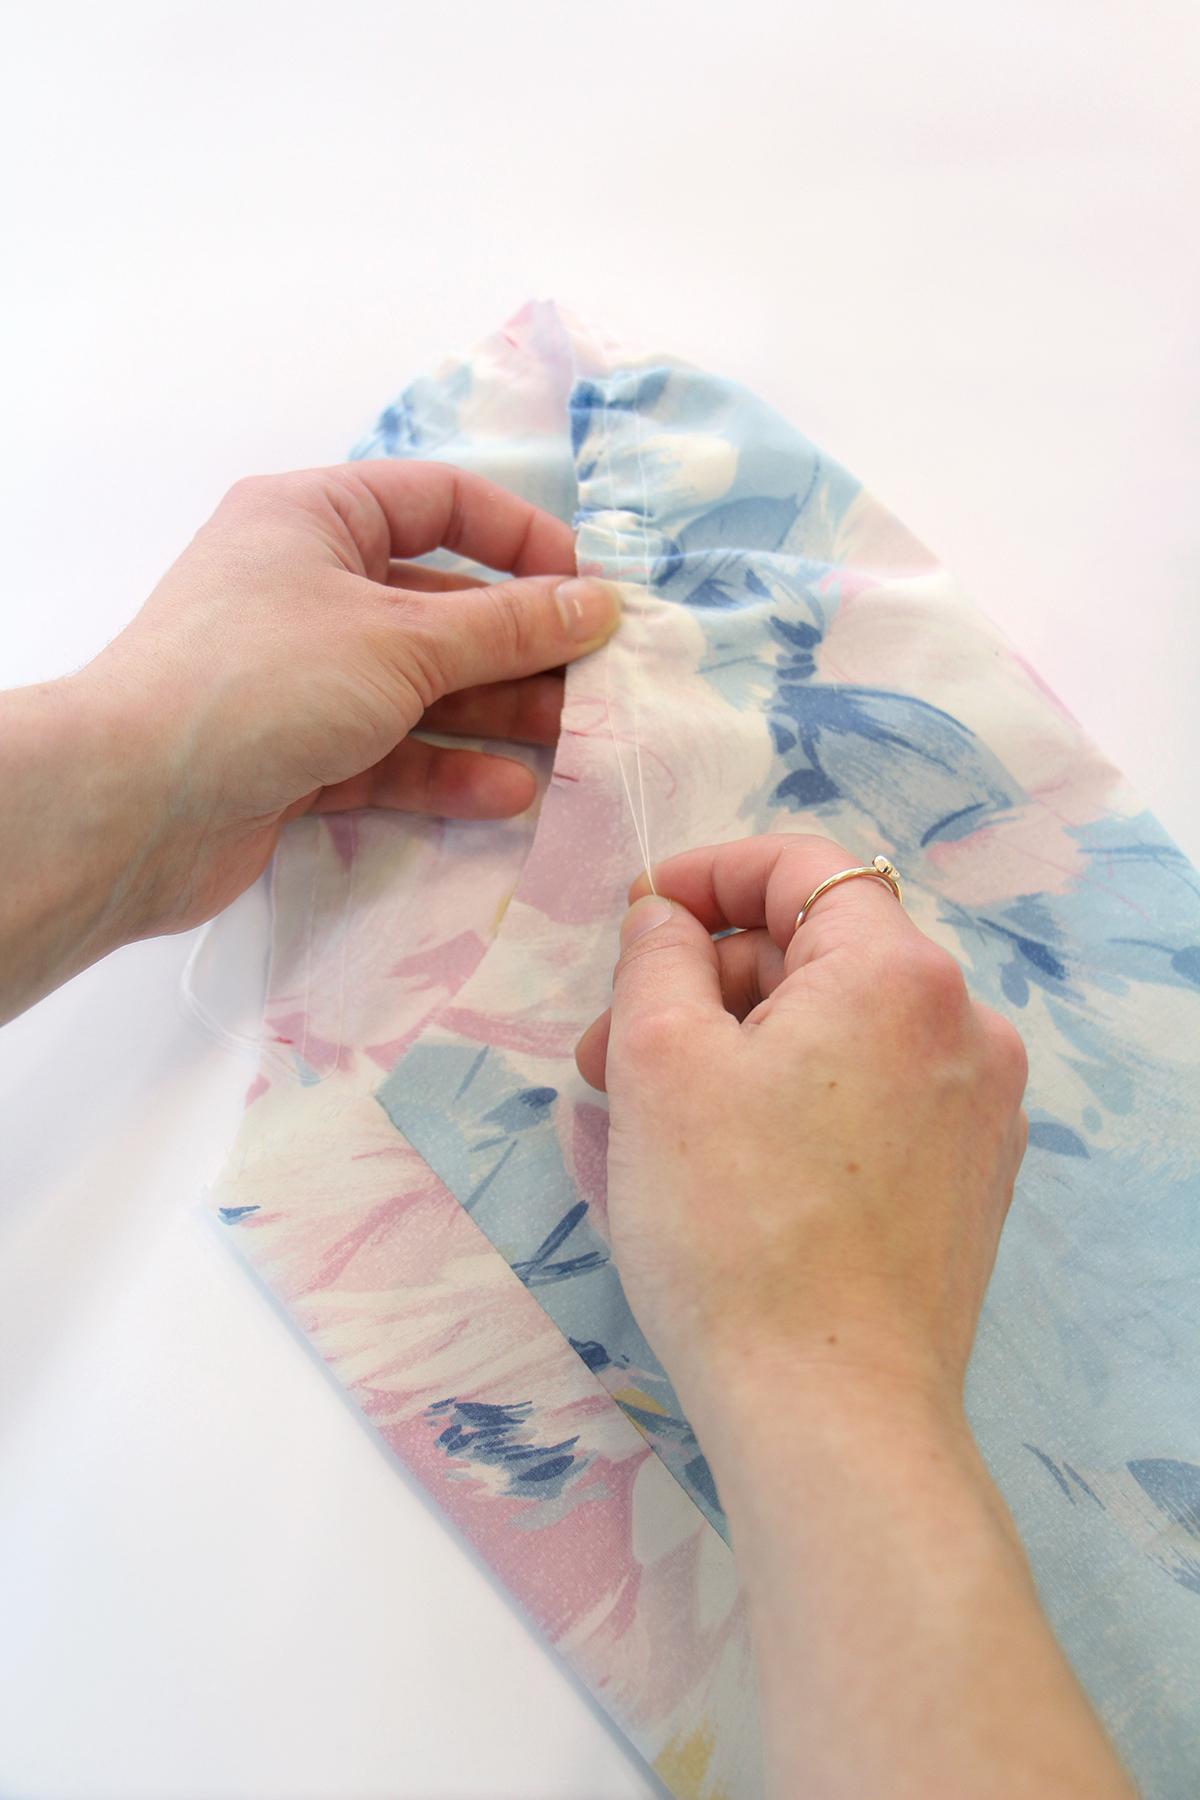 Megan Nielsen Patterns | Matilda Sewalong: Sleeves - Gathering Your Sleeve Head Easing Stitches